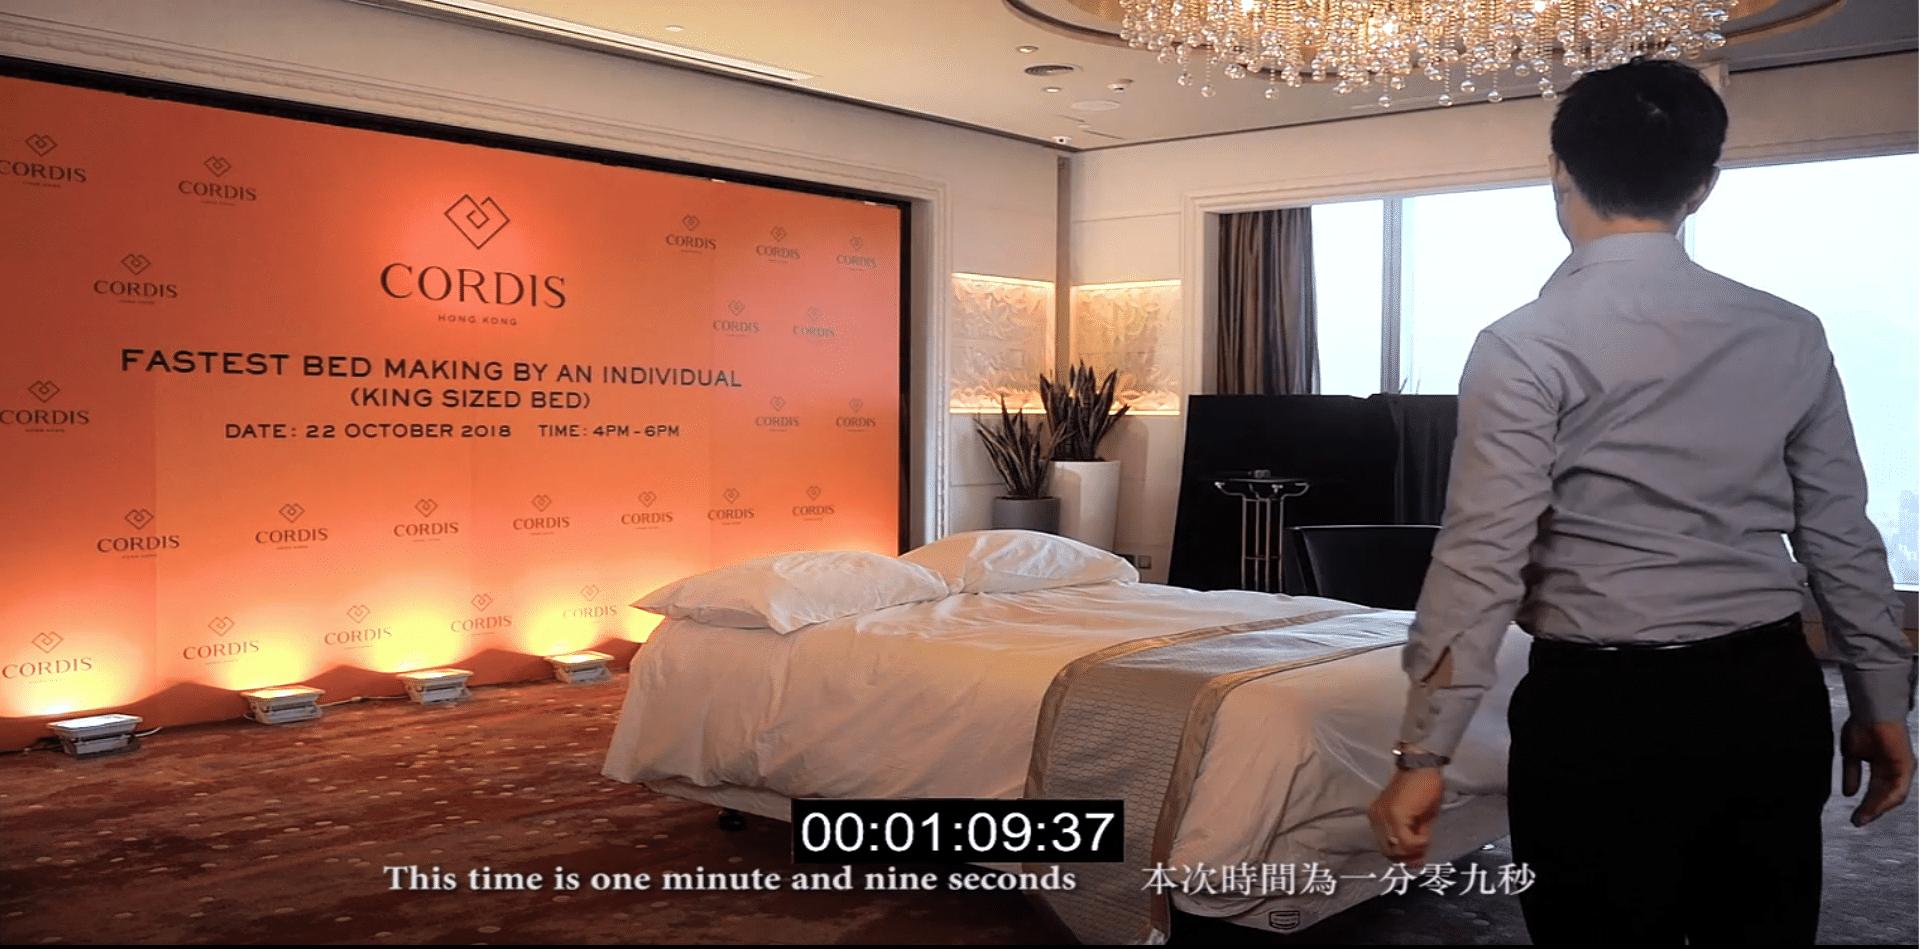 Cordis, Hong Kong housekeeping team member achieves Guinness World Record